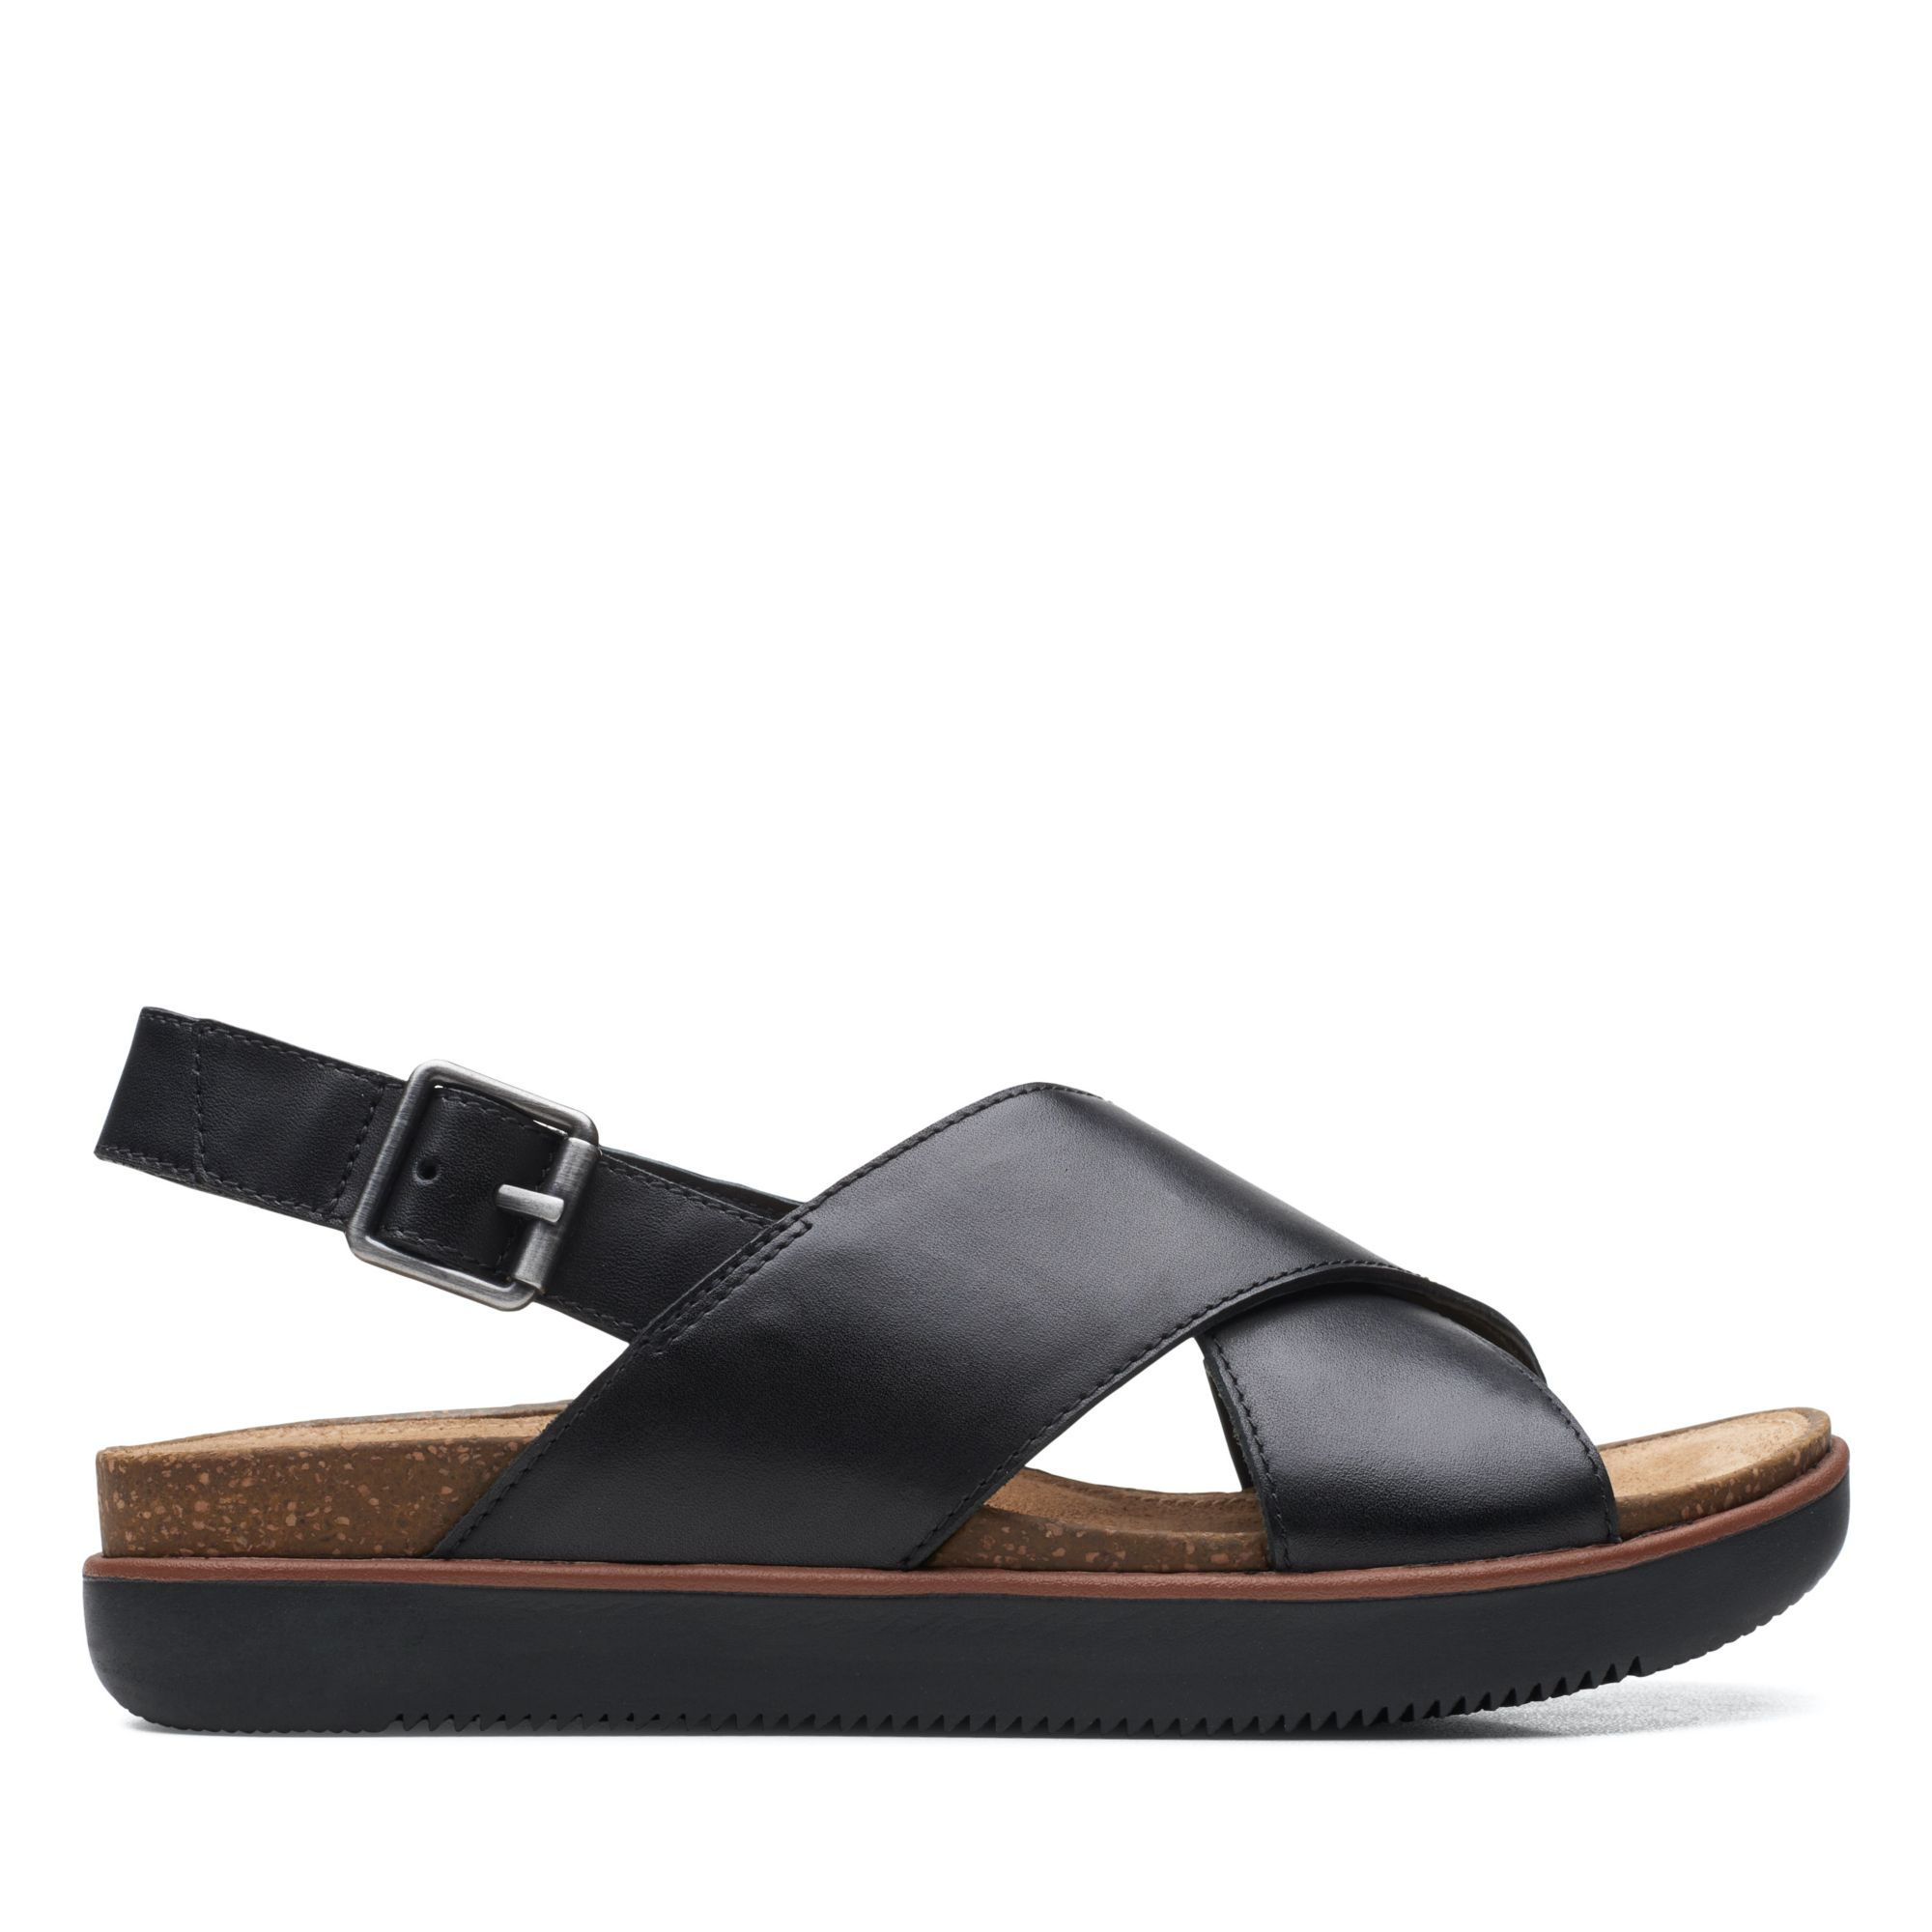 Clarks Elayne Cross – Leather